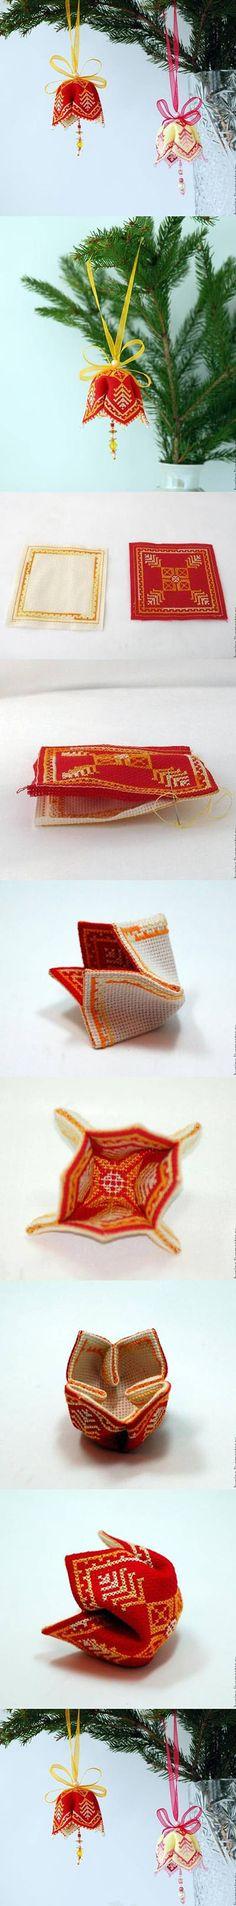 So Beautiful Decoration Craft | DIY & Crafts